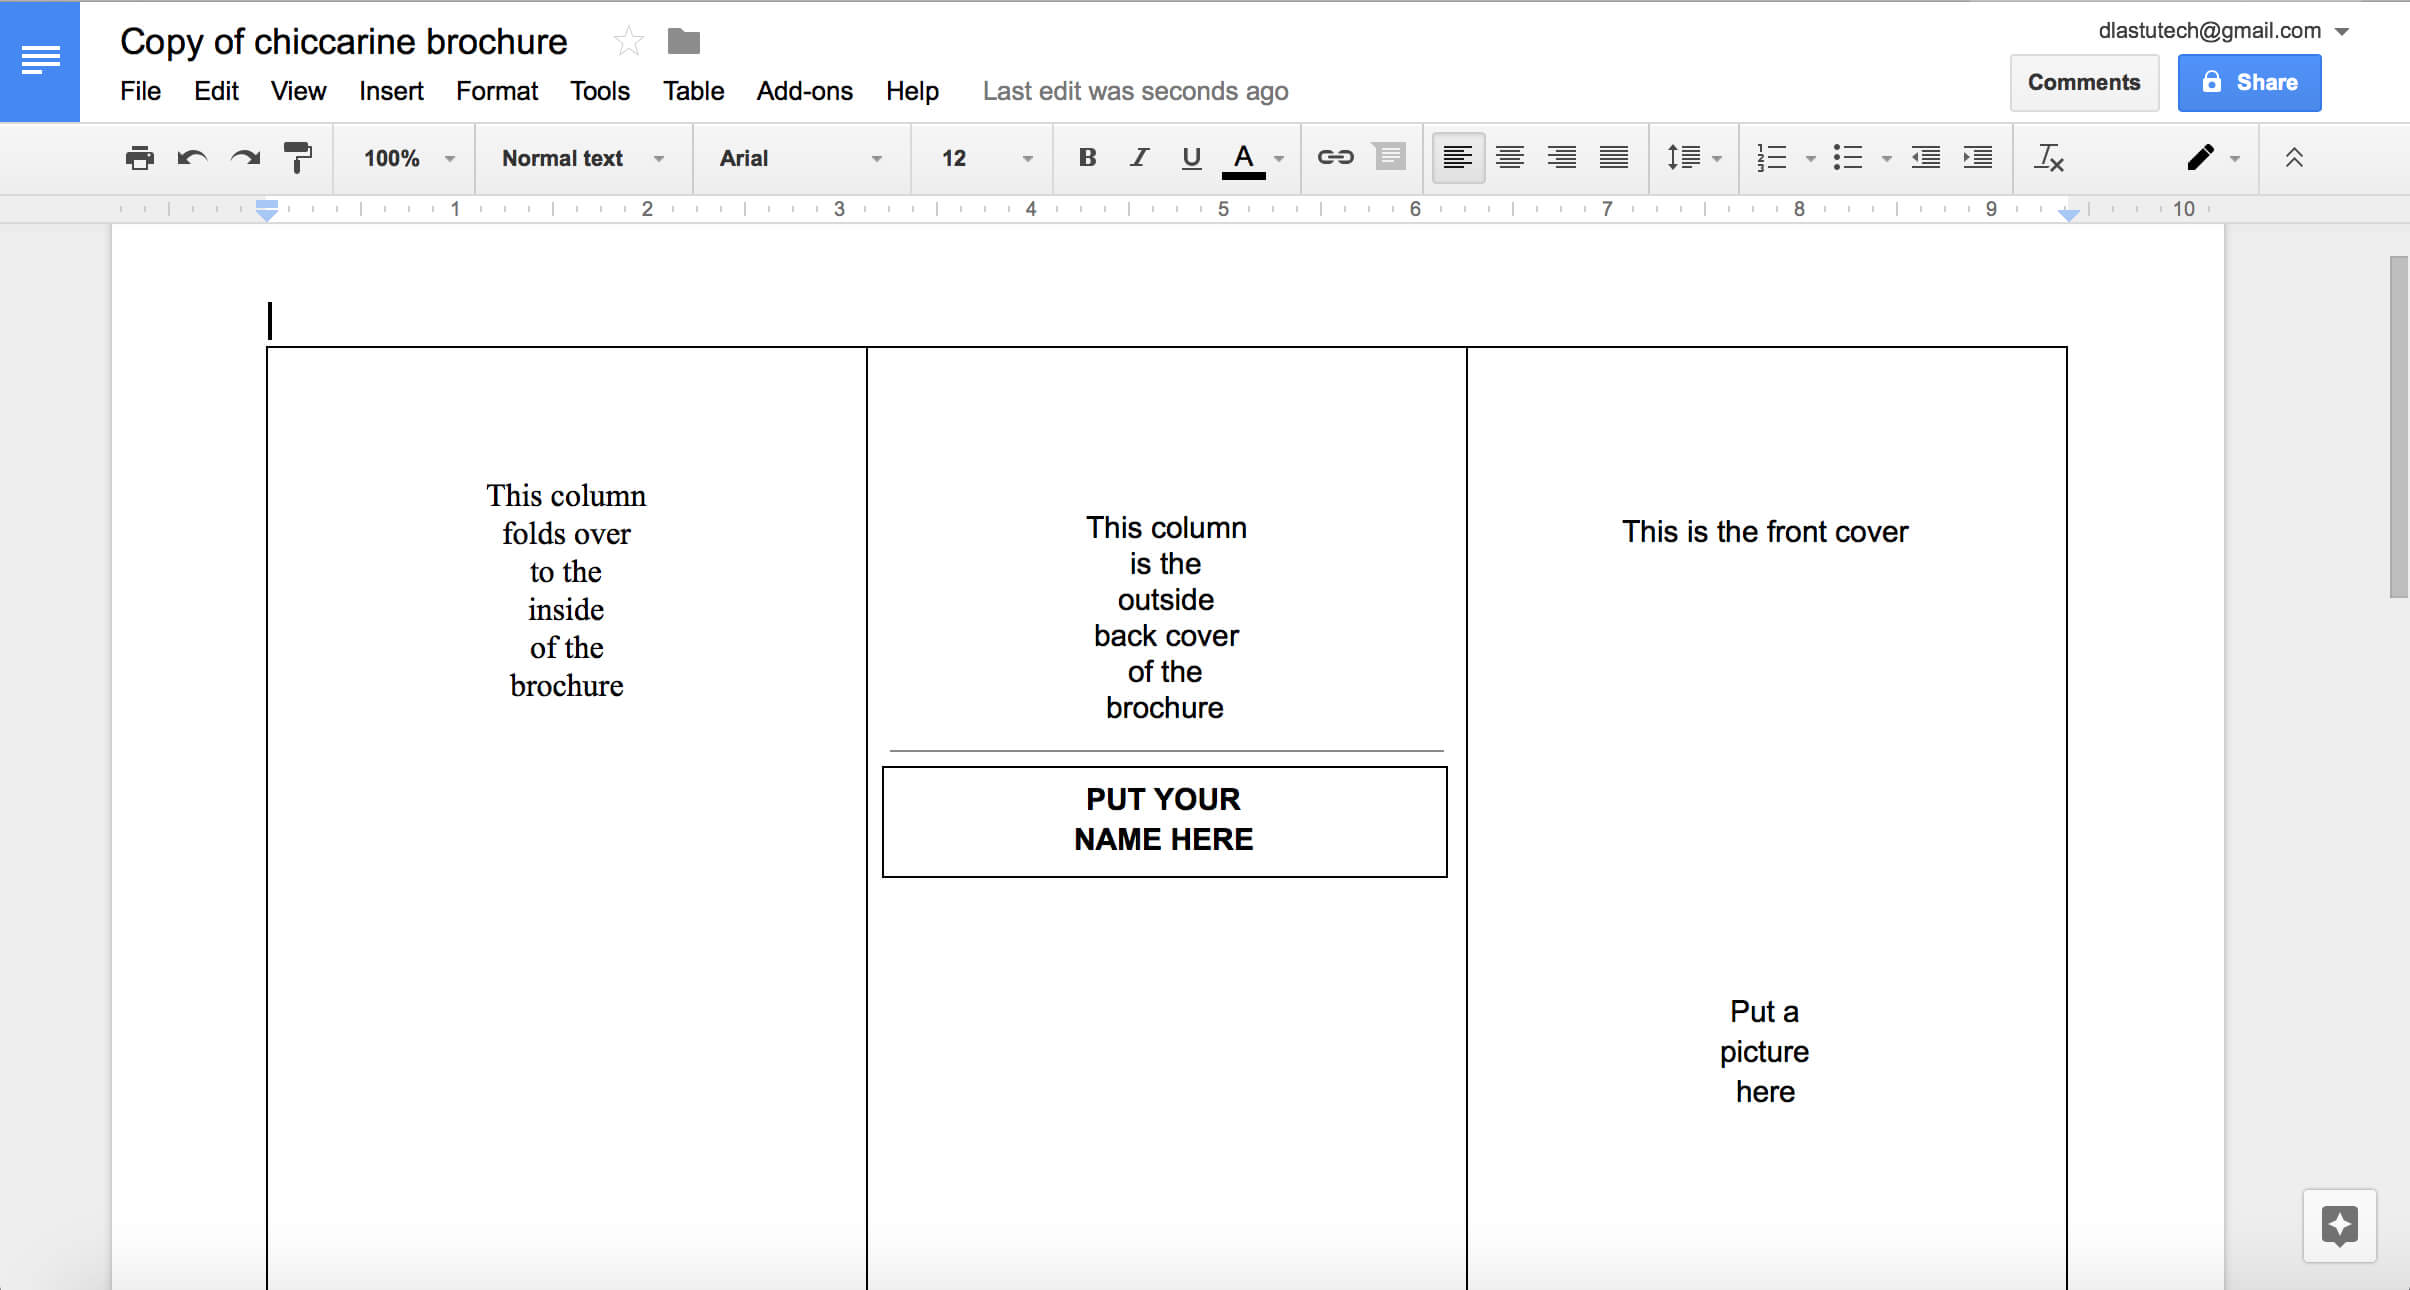 003 Template Ideas Pamphlet Google Docs Screen Shot At Pm Regarding Brochure Templates For Google Docs